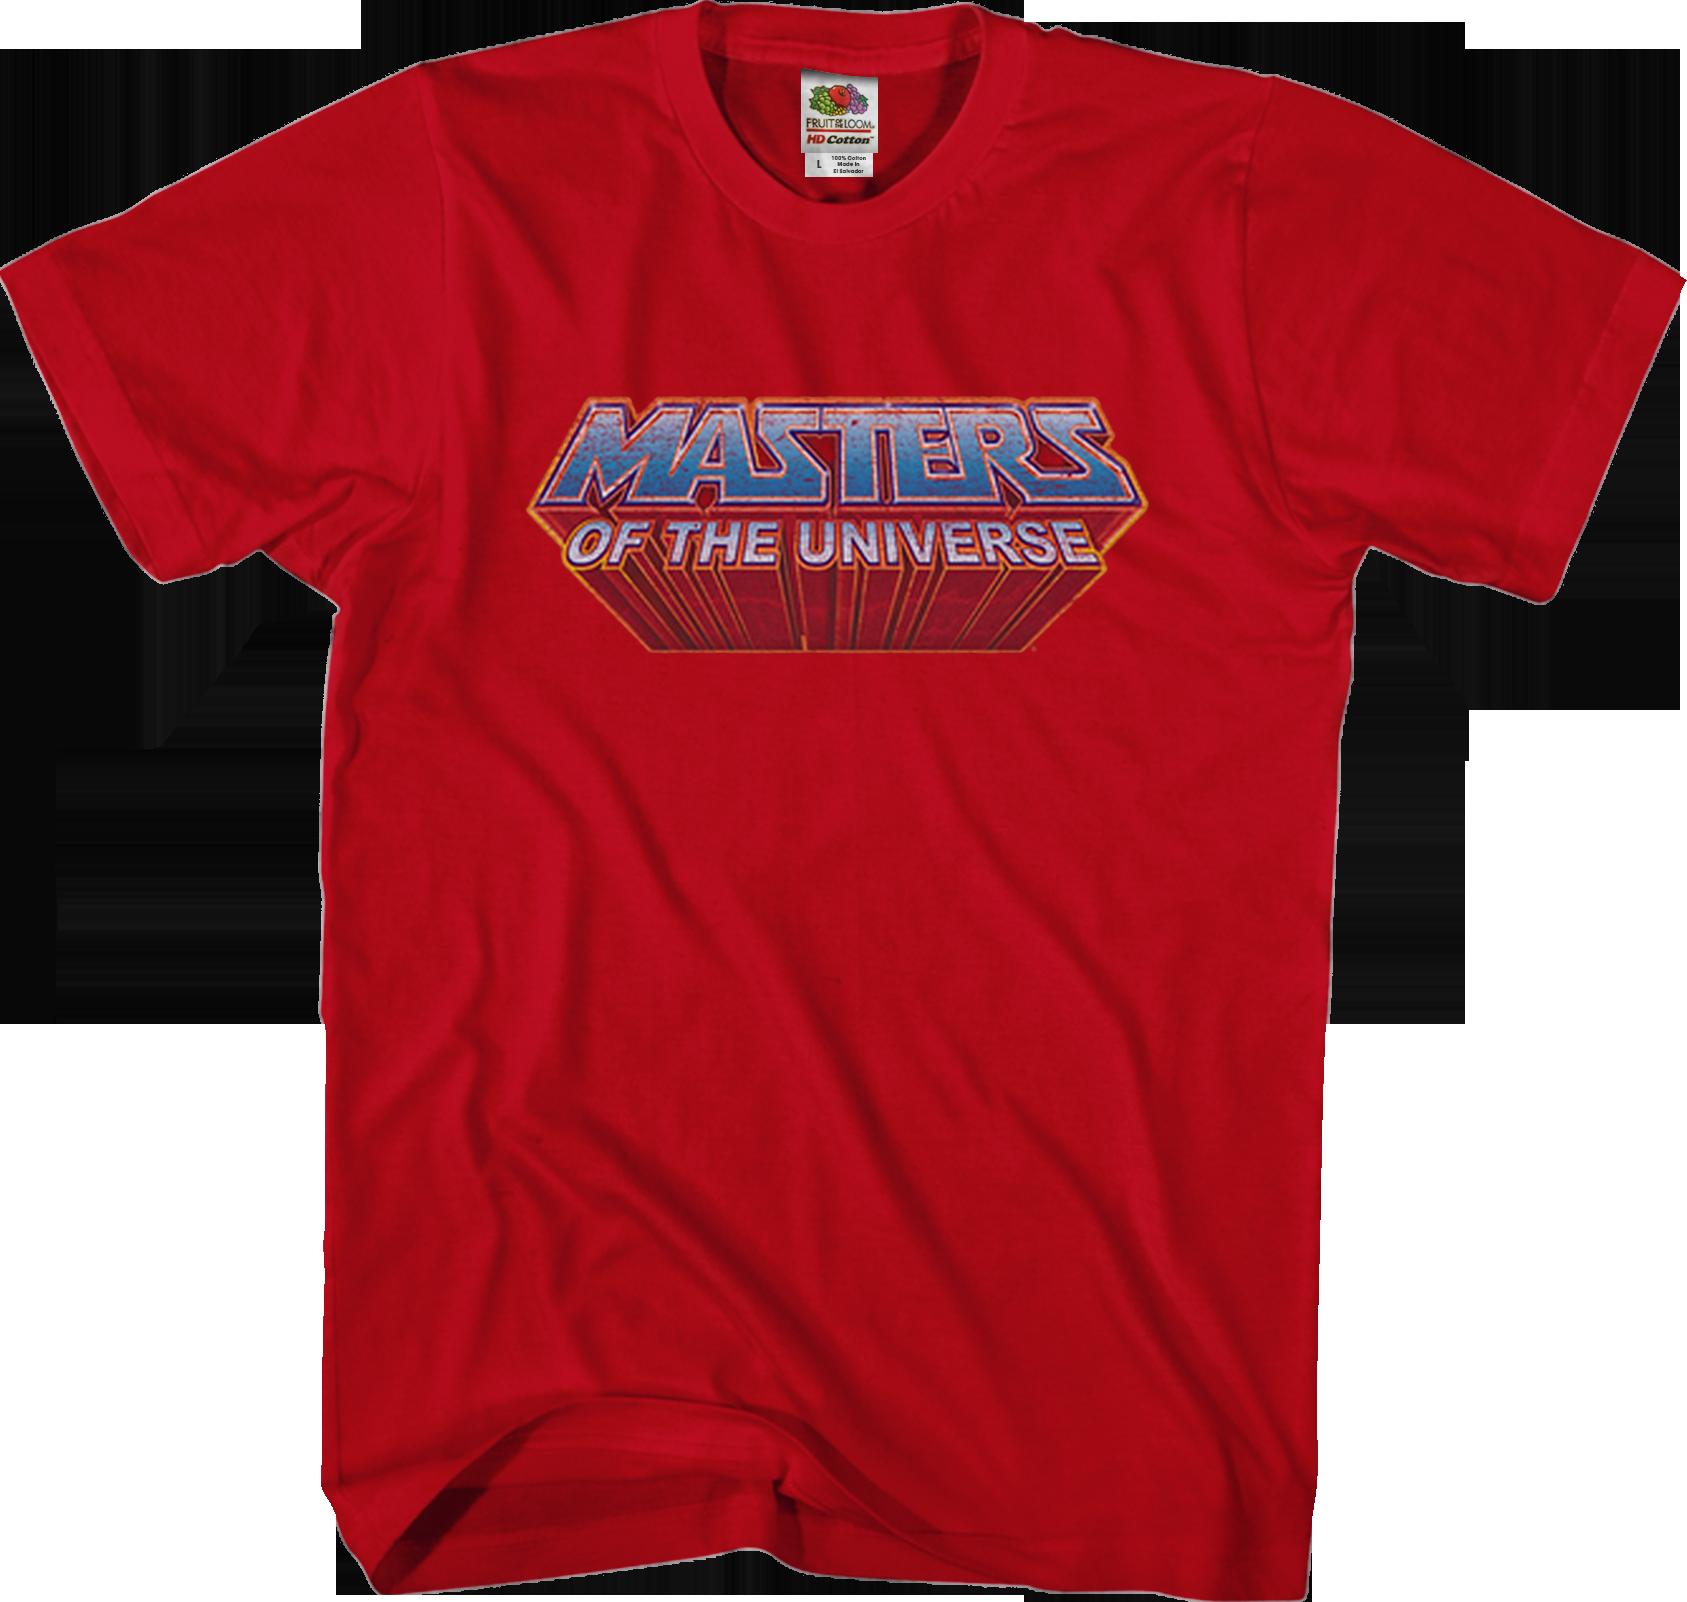 MASTER LOGO I T-SHIRT Masters Anime Series of the He Battle Cat Universe Man